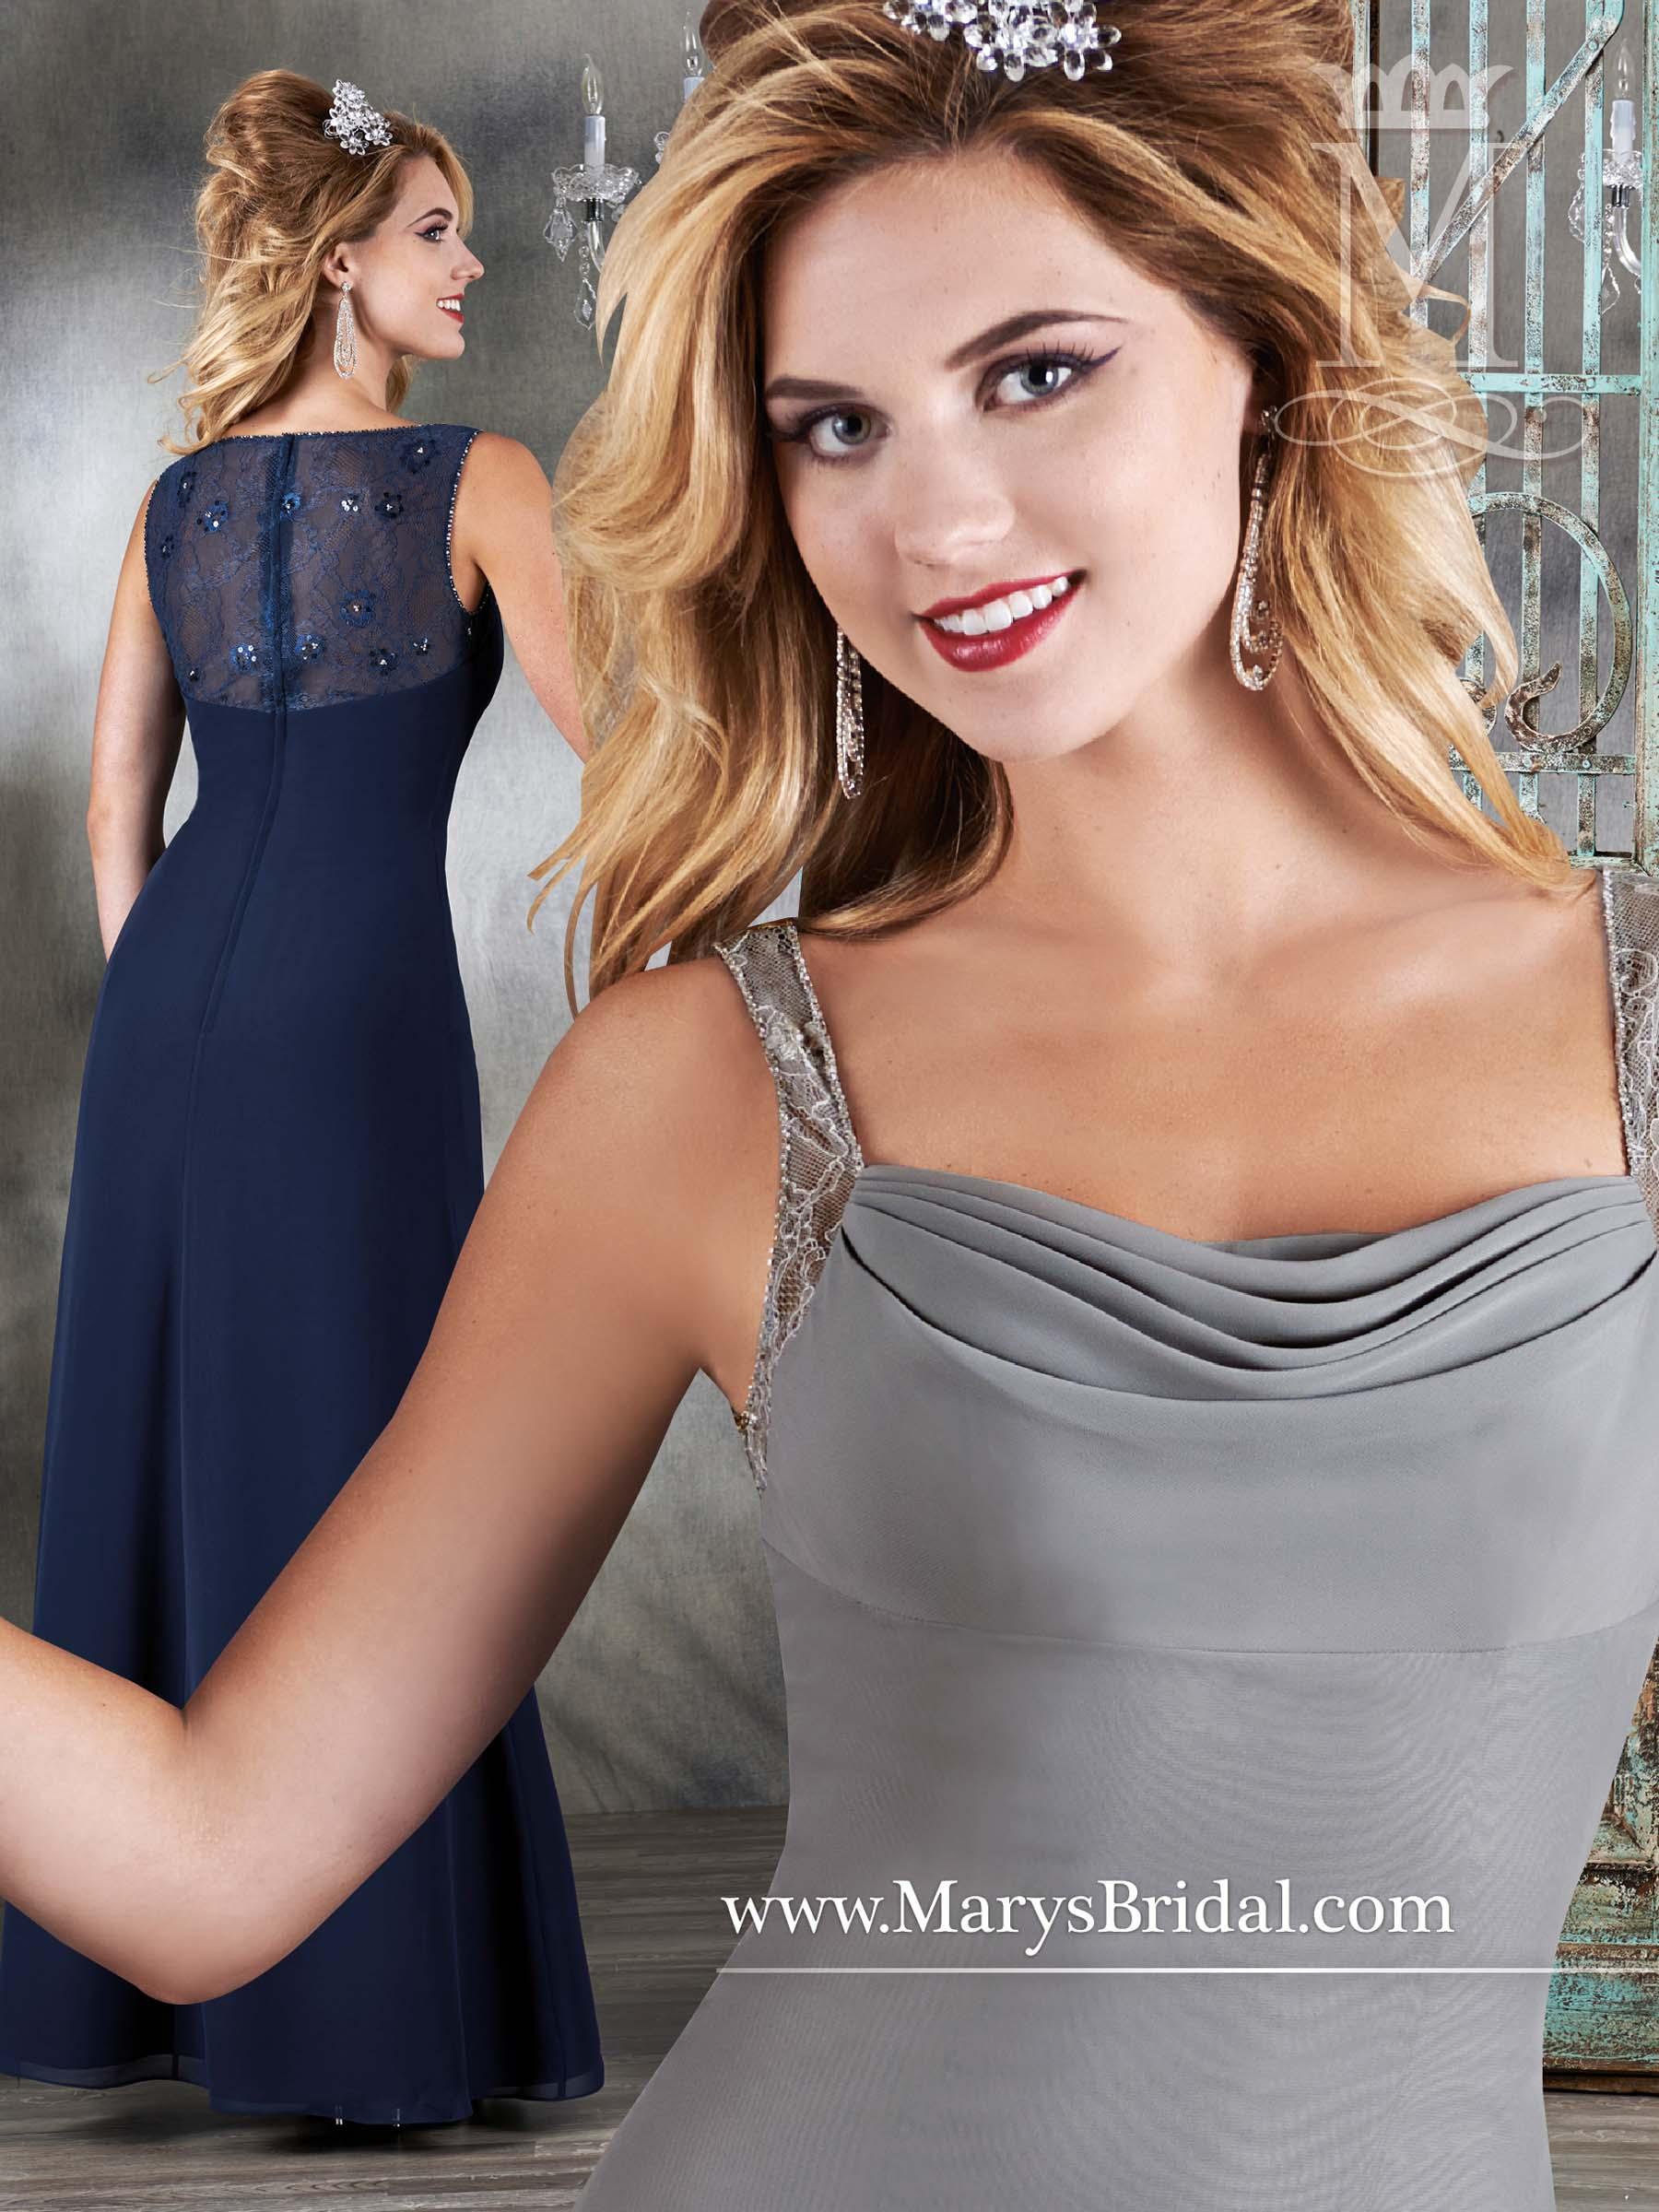 Marys bridal bridesmaid dress.jpg